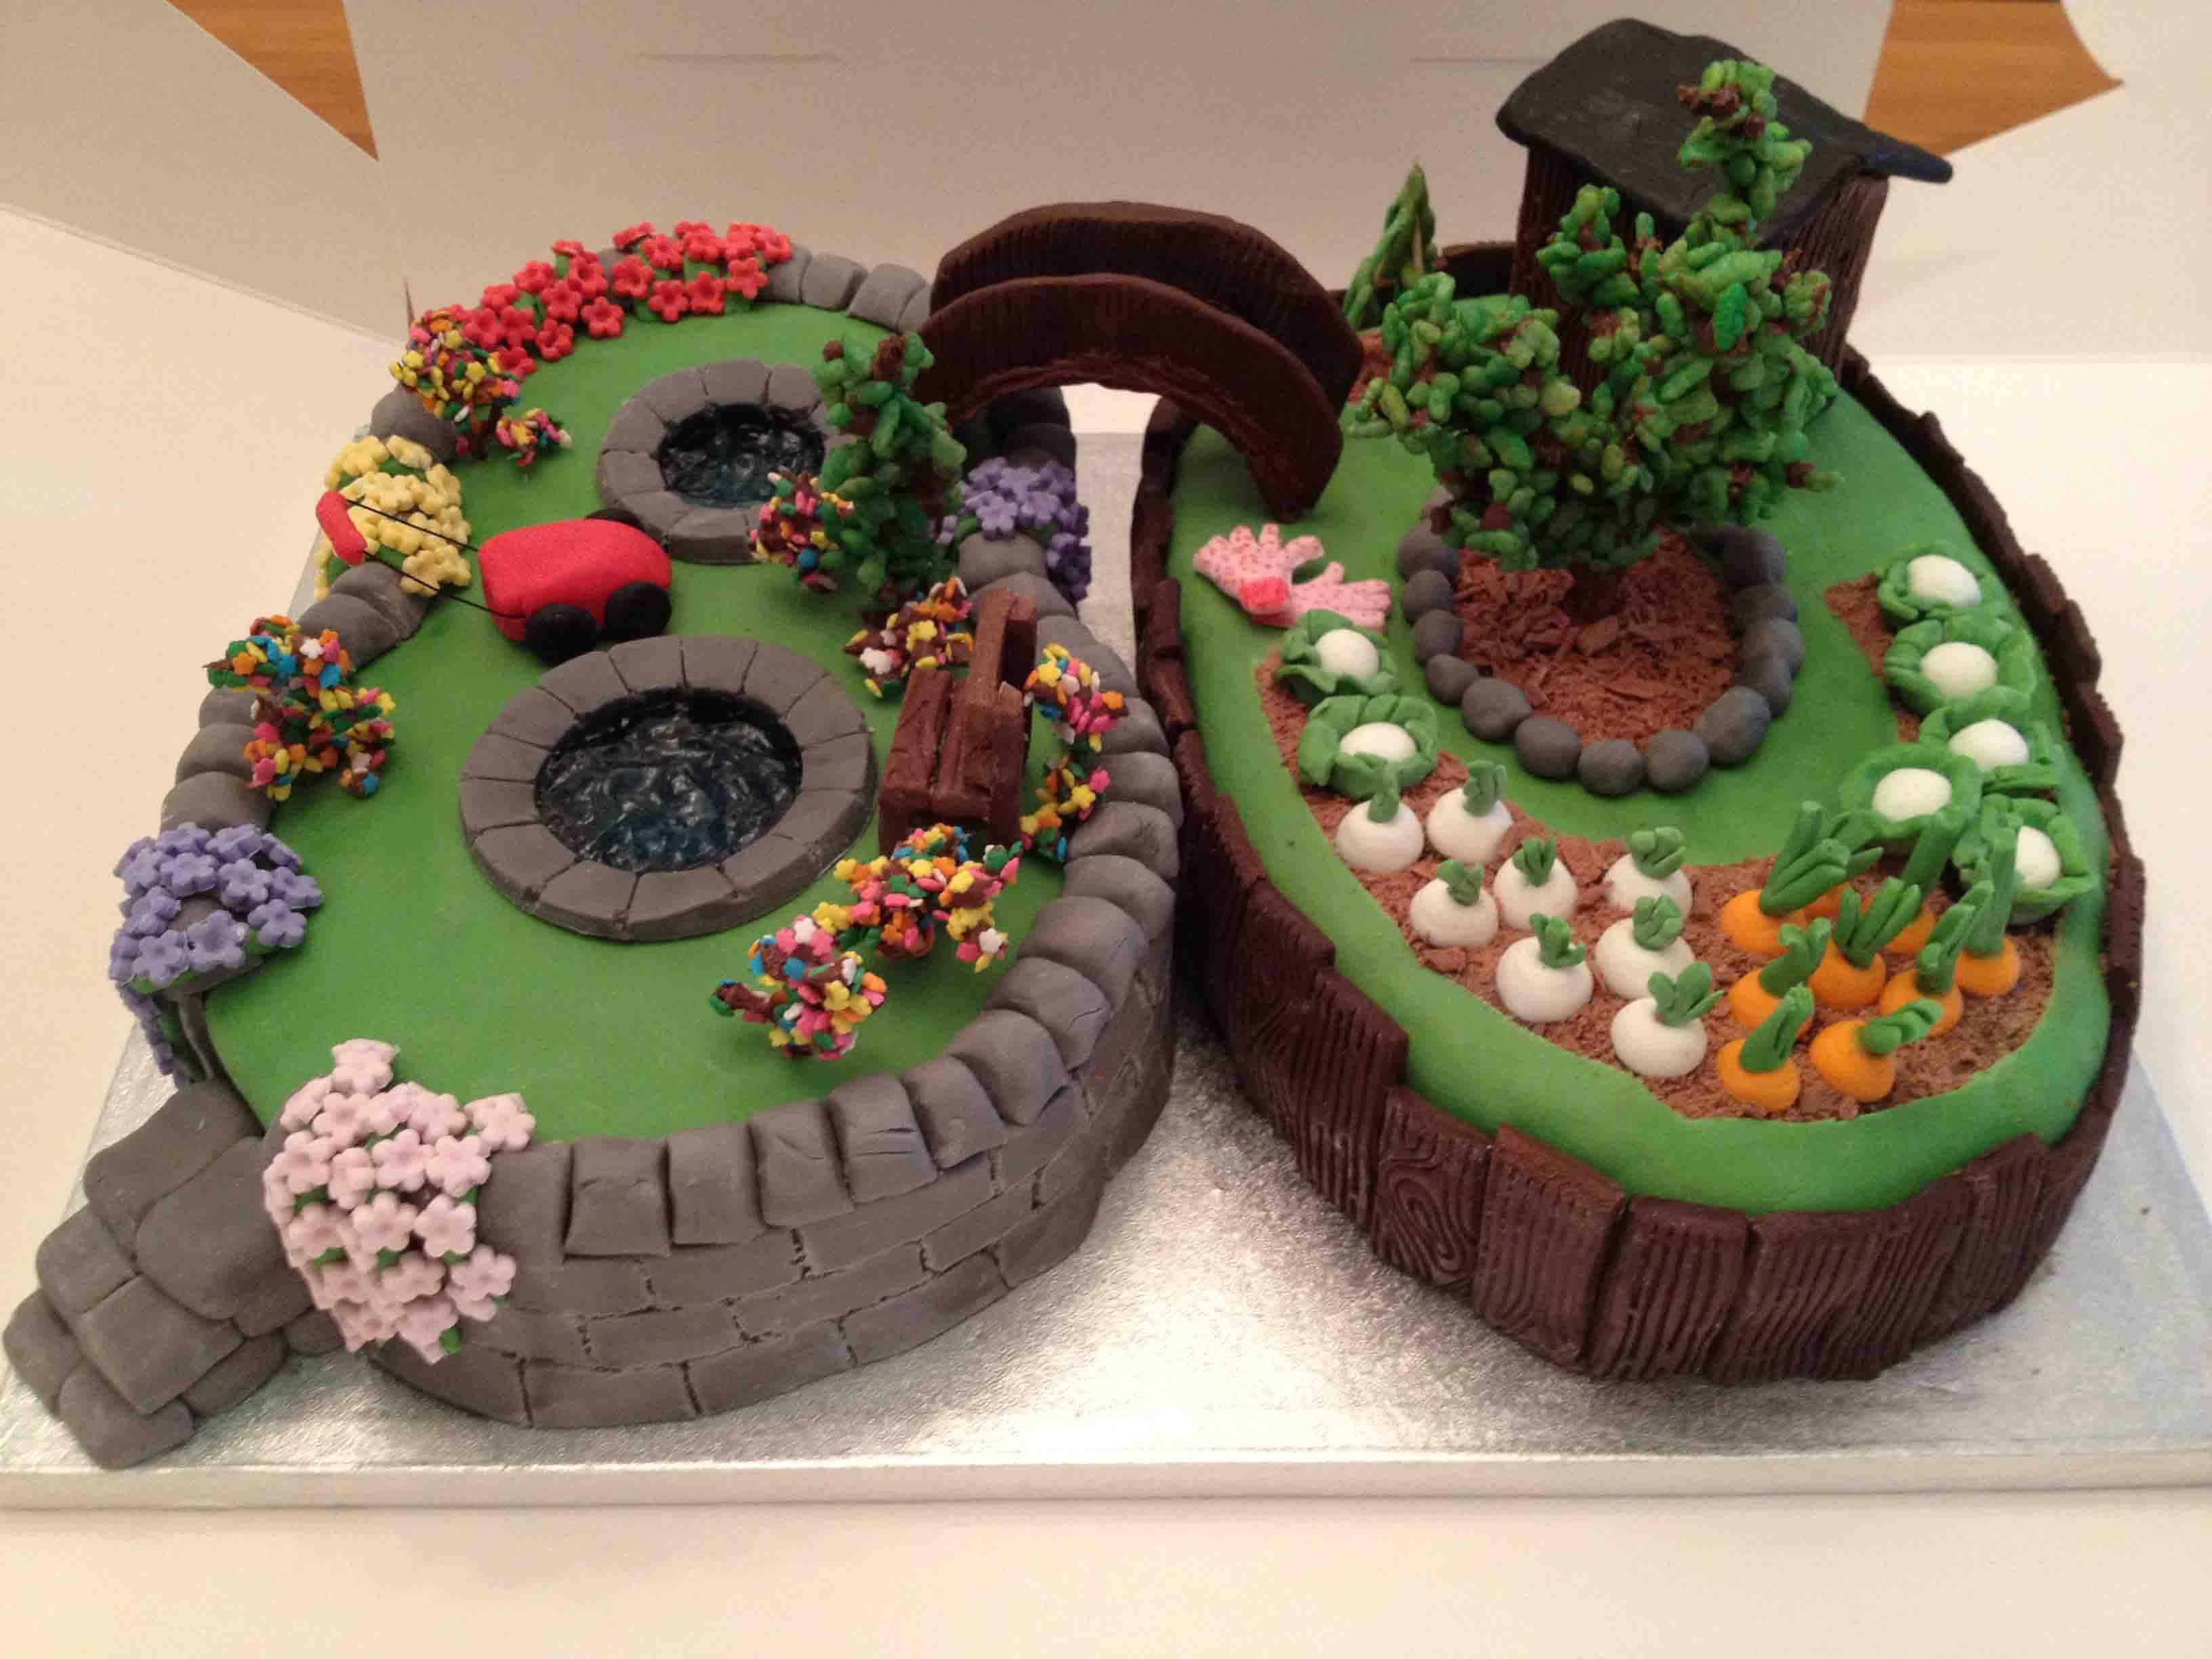 garden cakes - Google Search   Gardening Cakes   Pinterest ...